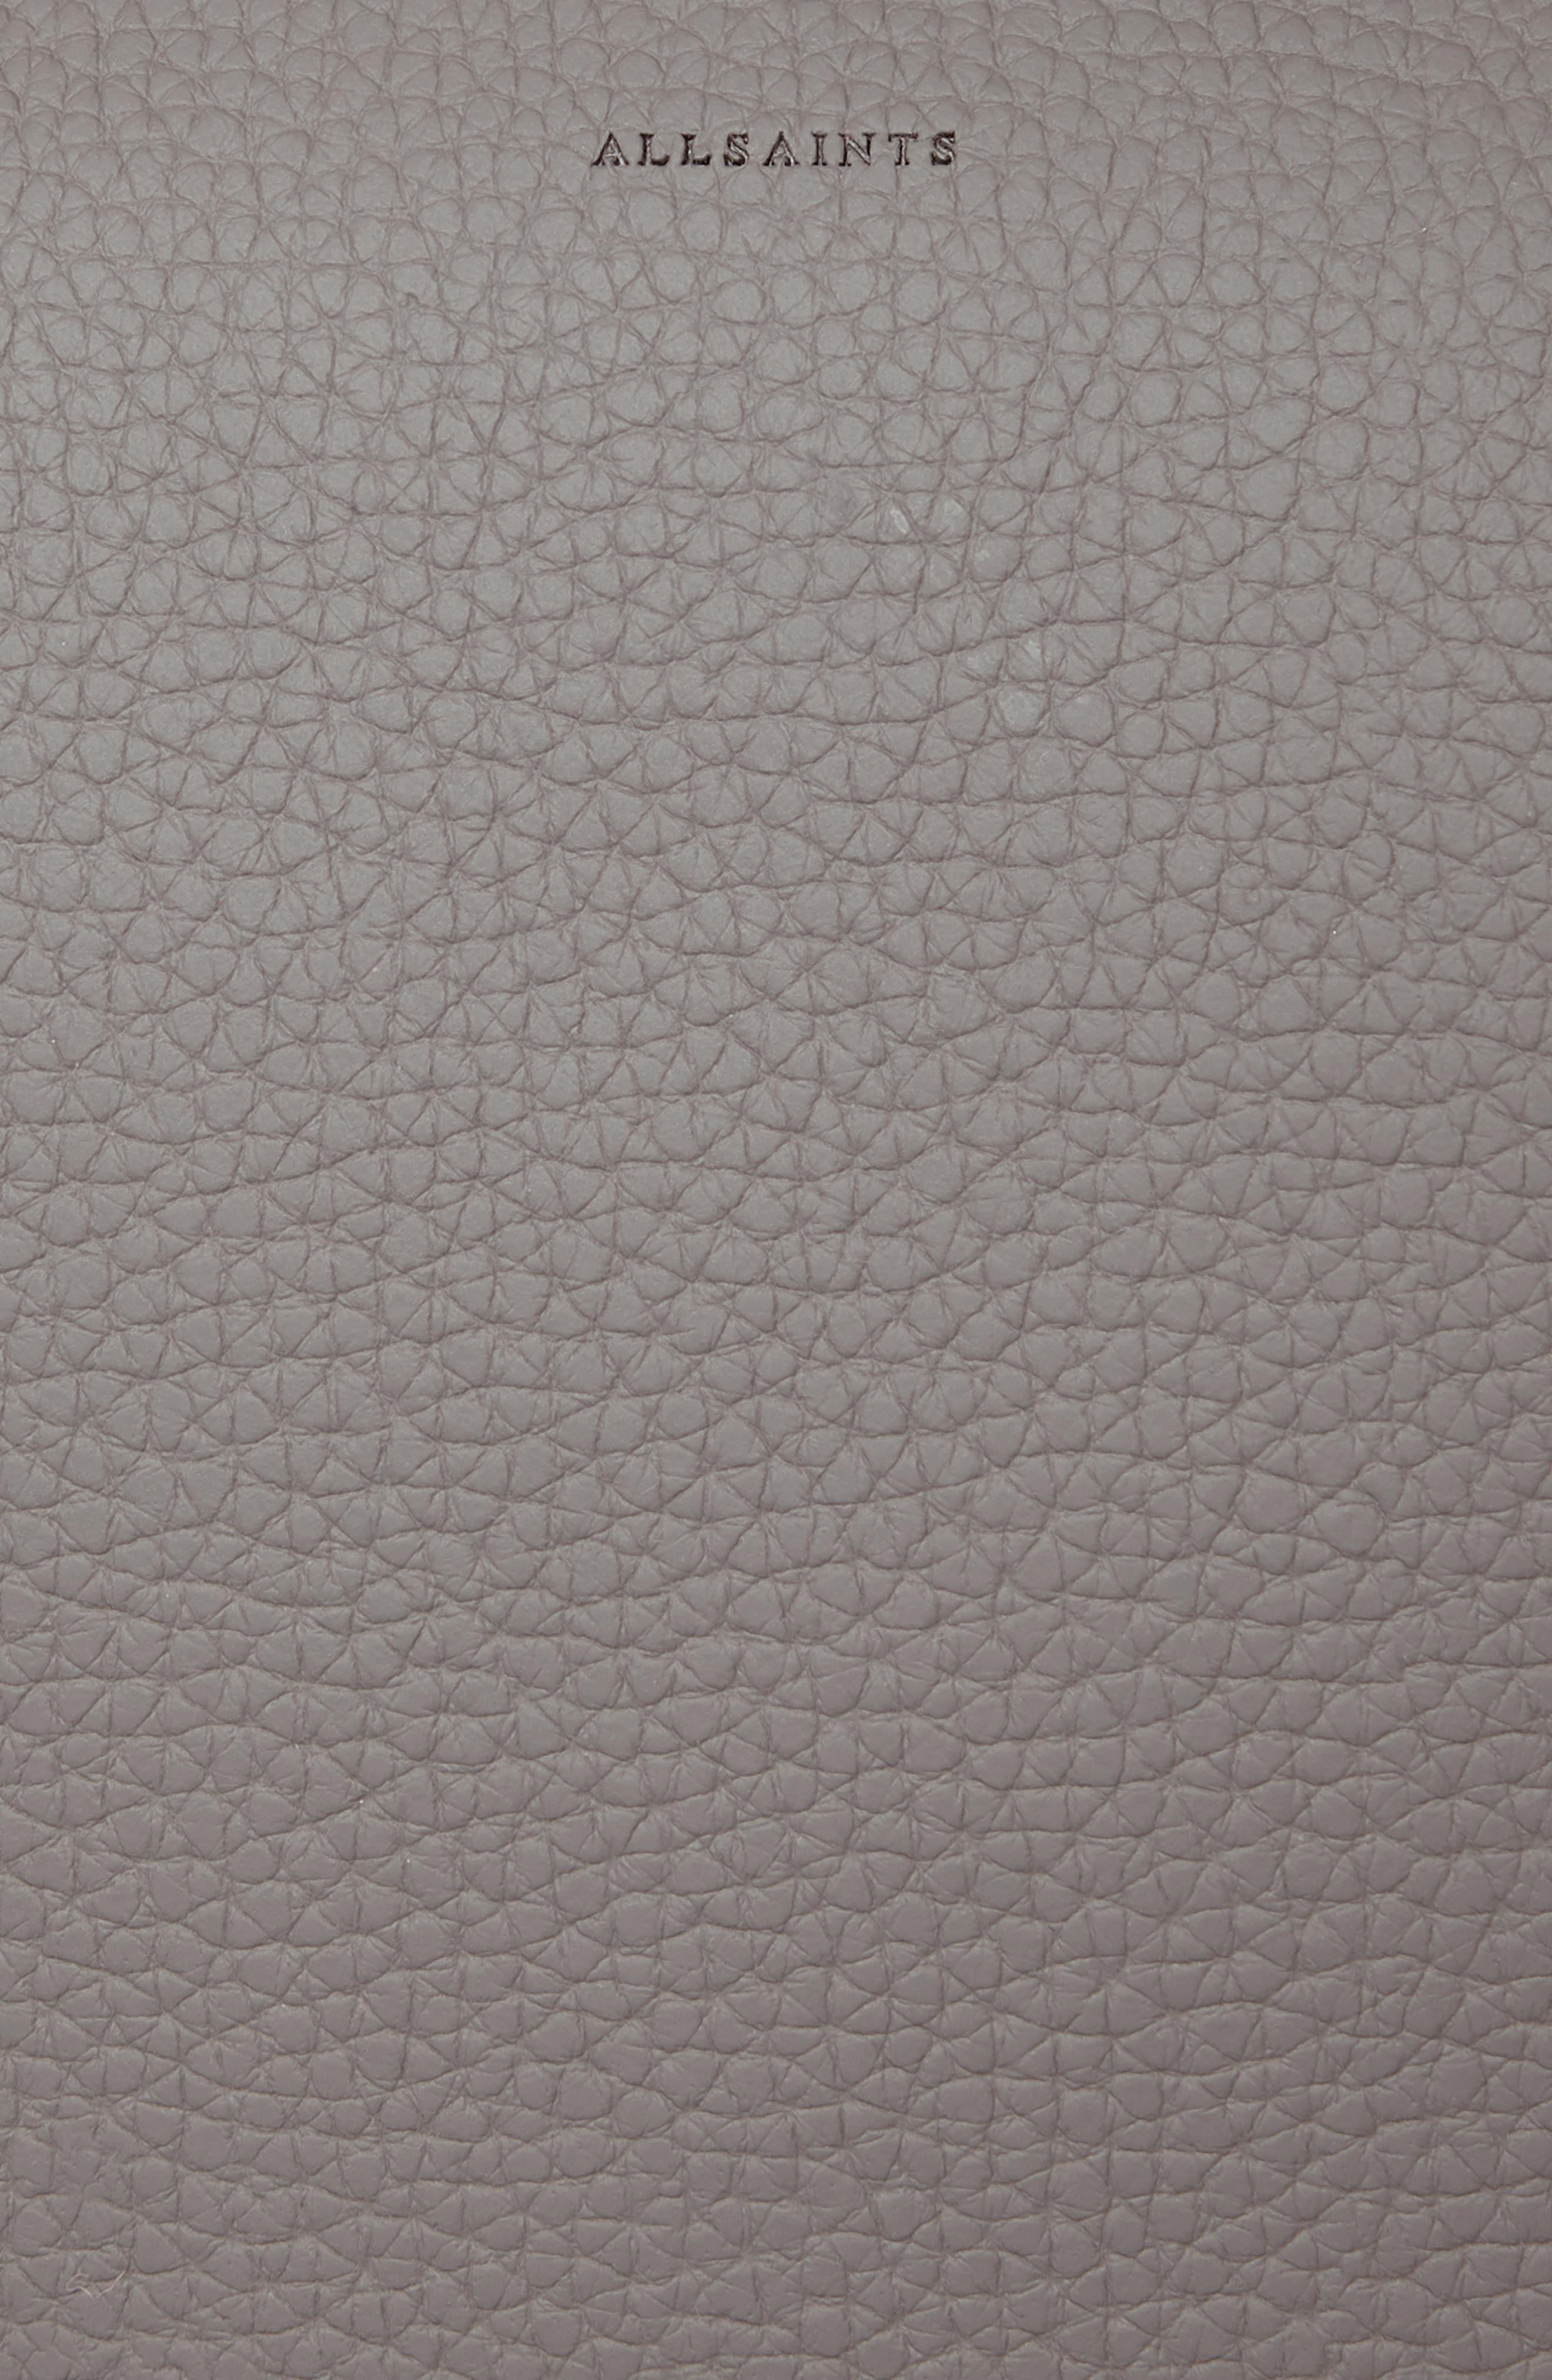 'Kita' Leather Shoulder/Crossbody Bag,                             Alternate thumbnail 6, color,                             STORM GREY